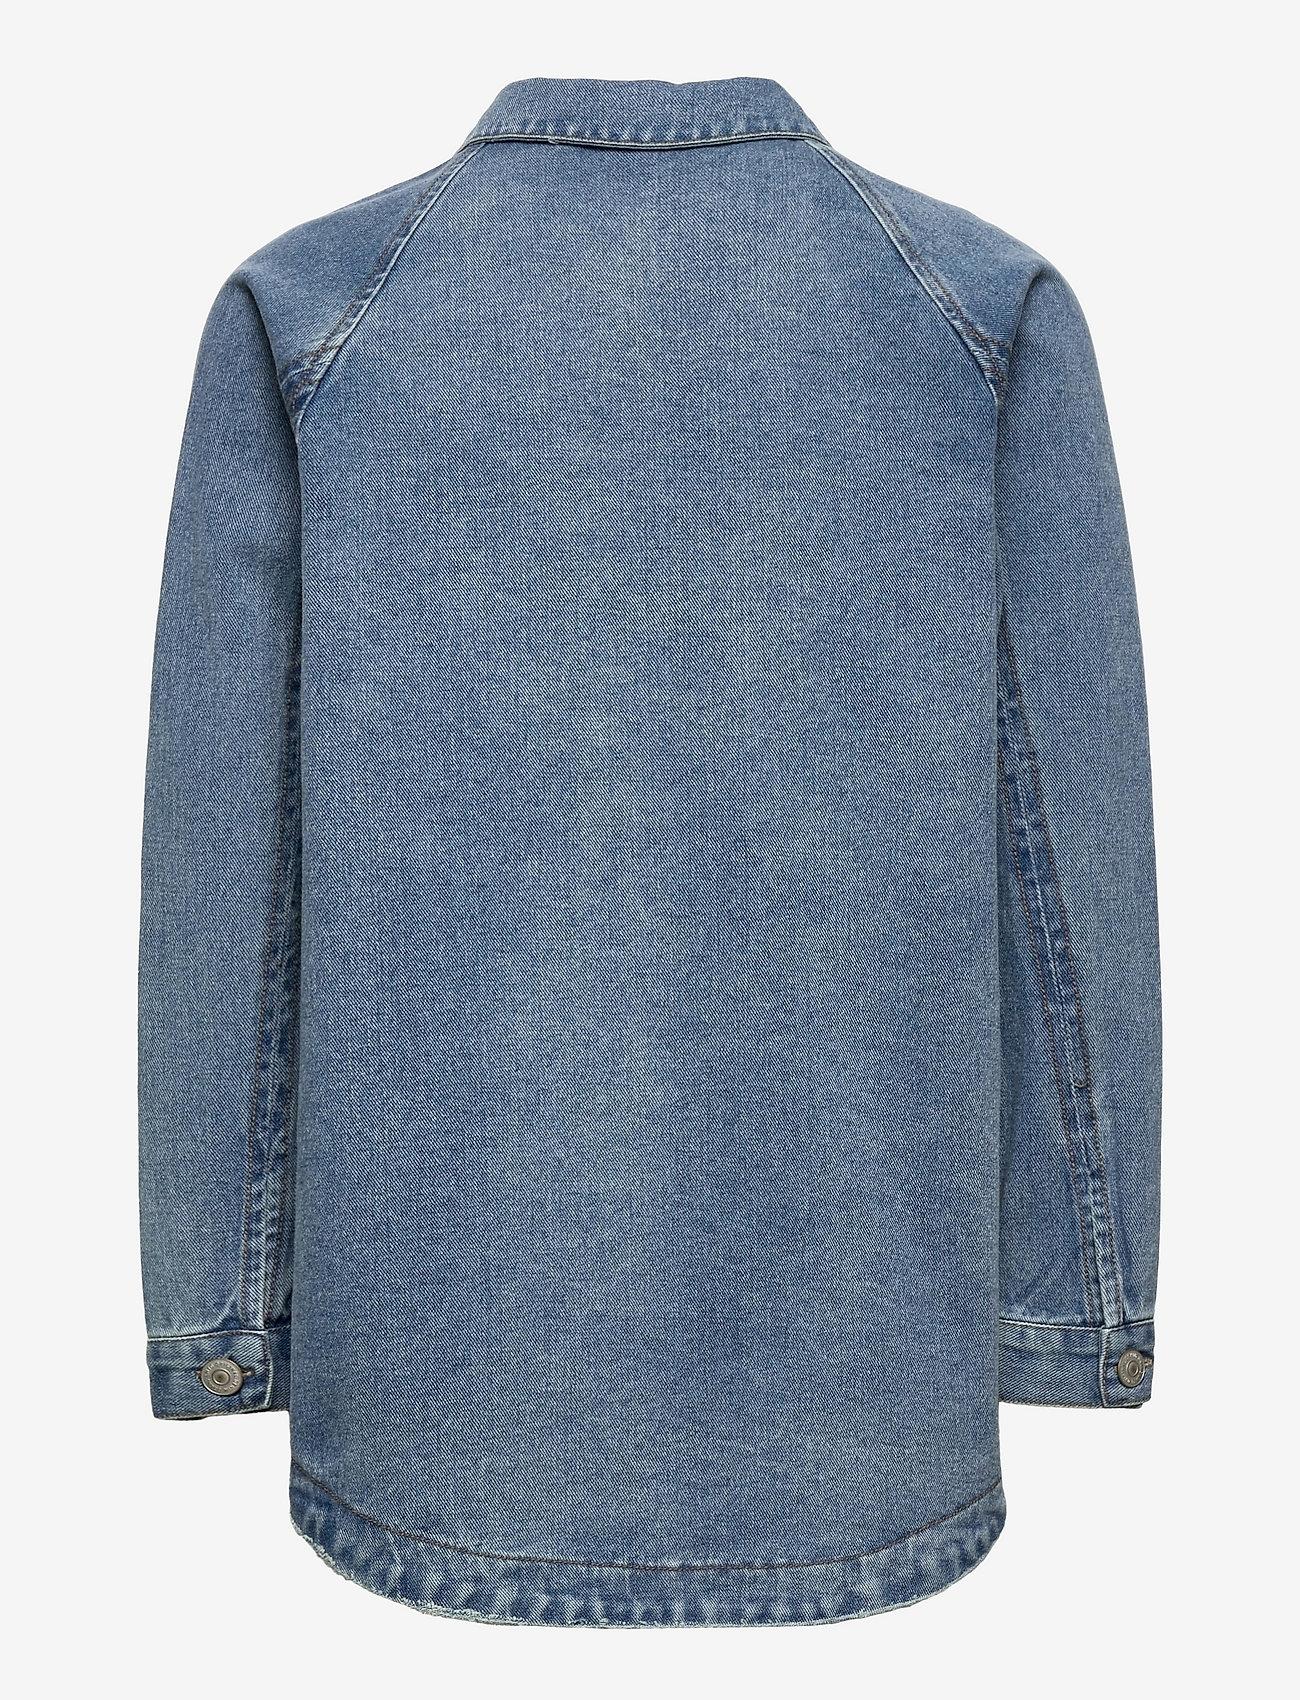 LMTD - NLFNINDY DNM LS OVERSIZE JACKET - overshirts - medium blue denim - 1